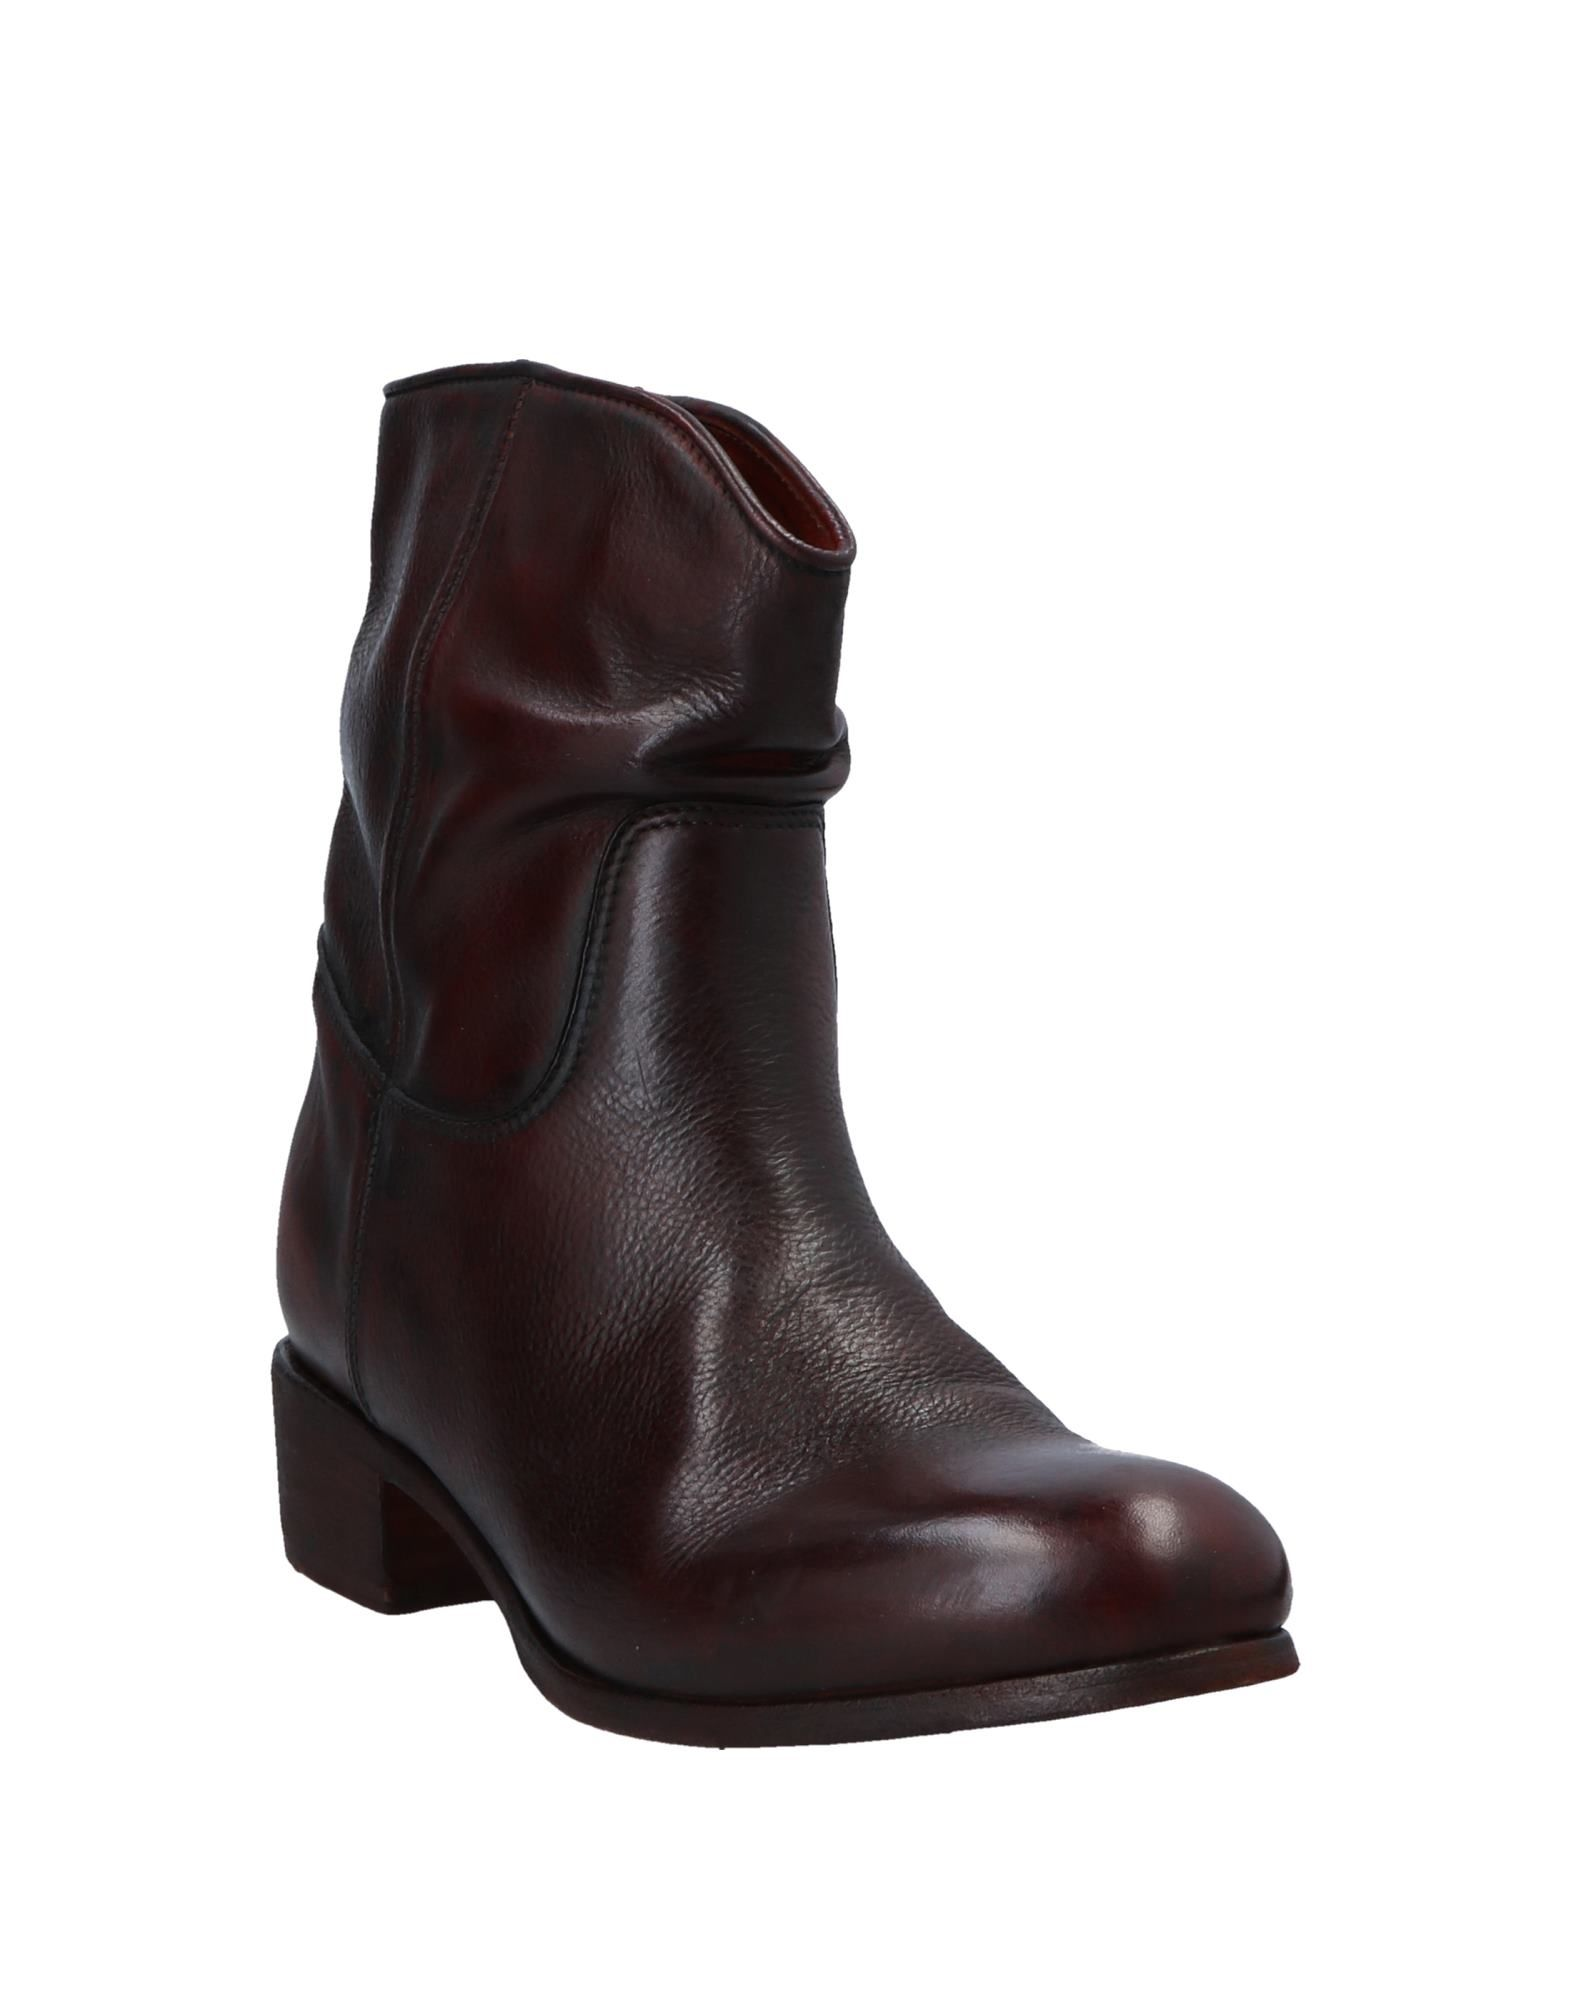 El Campero Stiefelette Damen  11545588AEGut aussehende aussehende aussehende strapazierfähige Schuhe c1c2b0